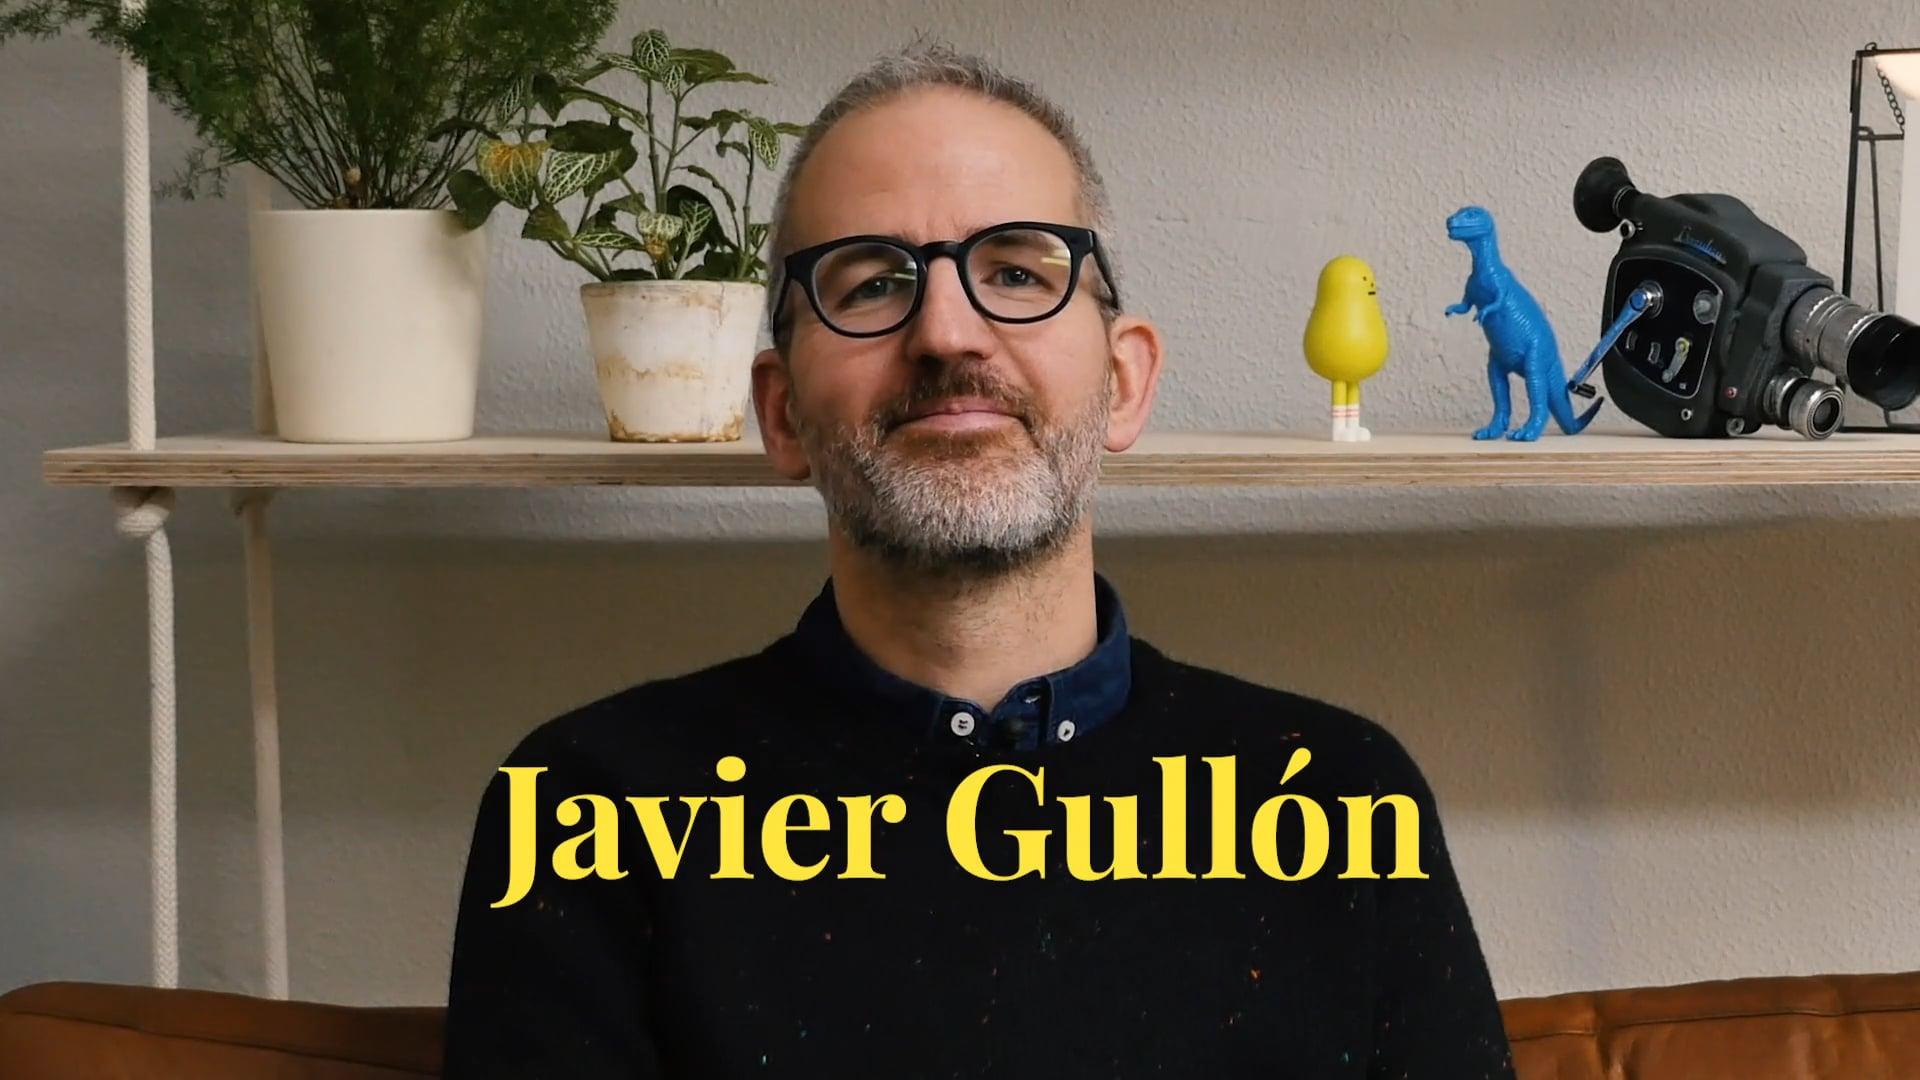 VDVET - Aritz Moreno habla de Javier Gullón